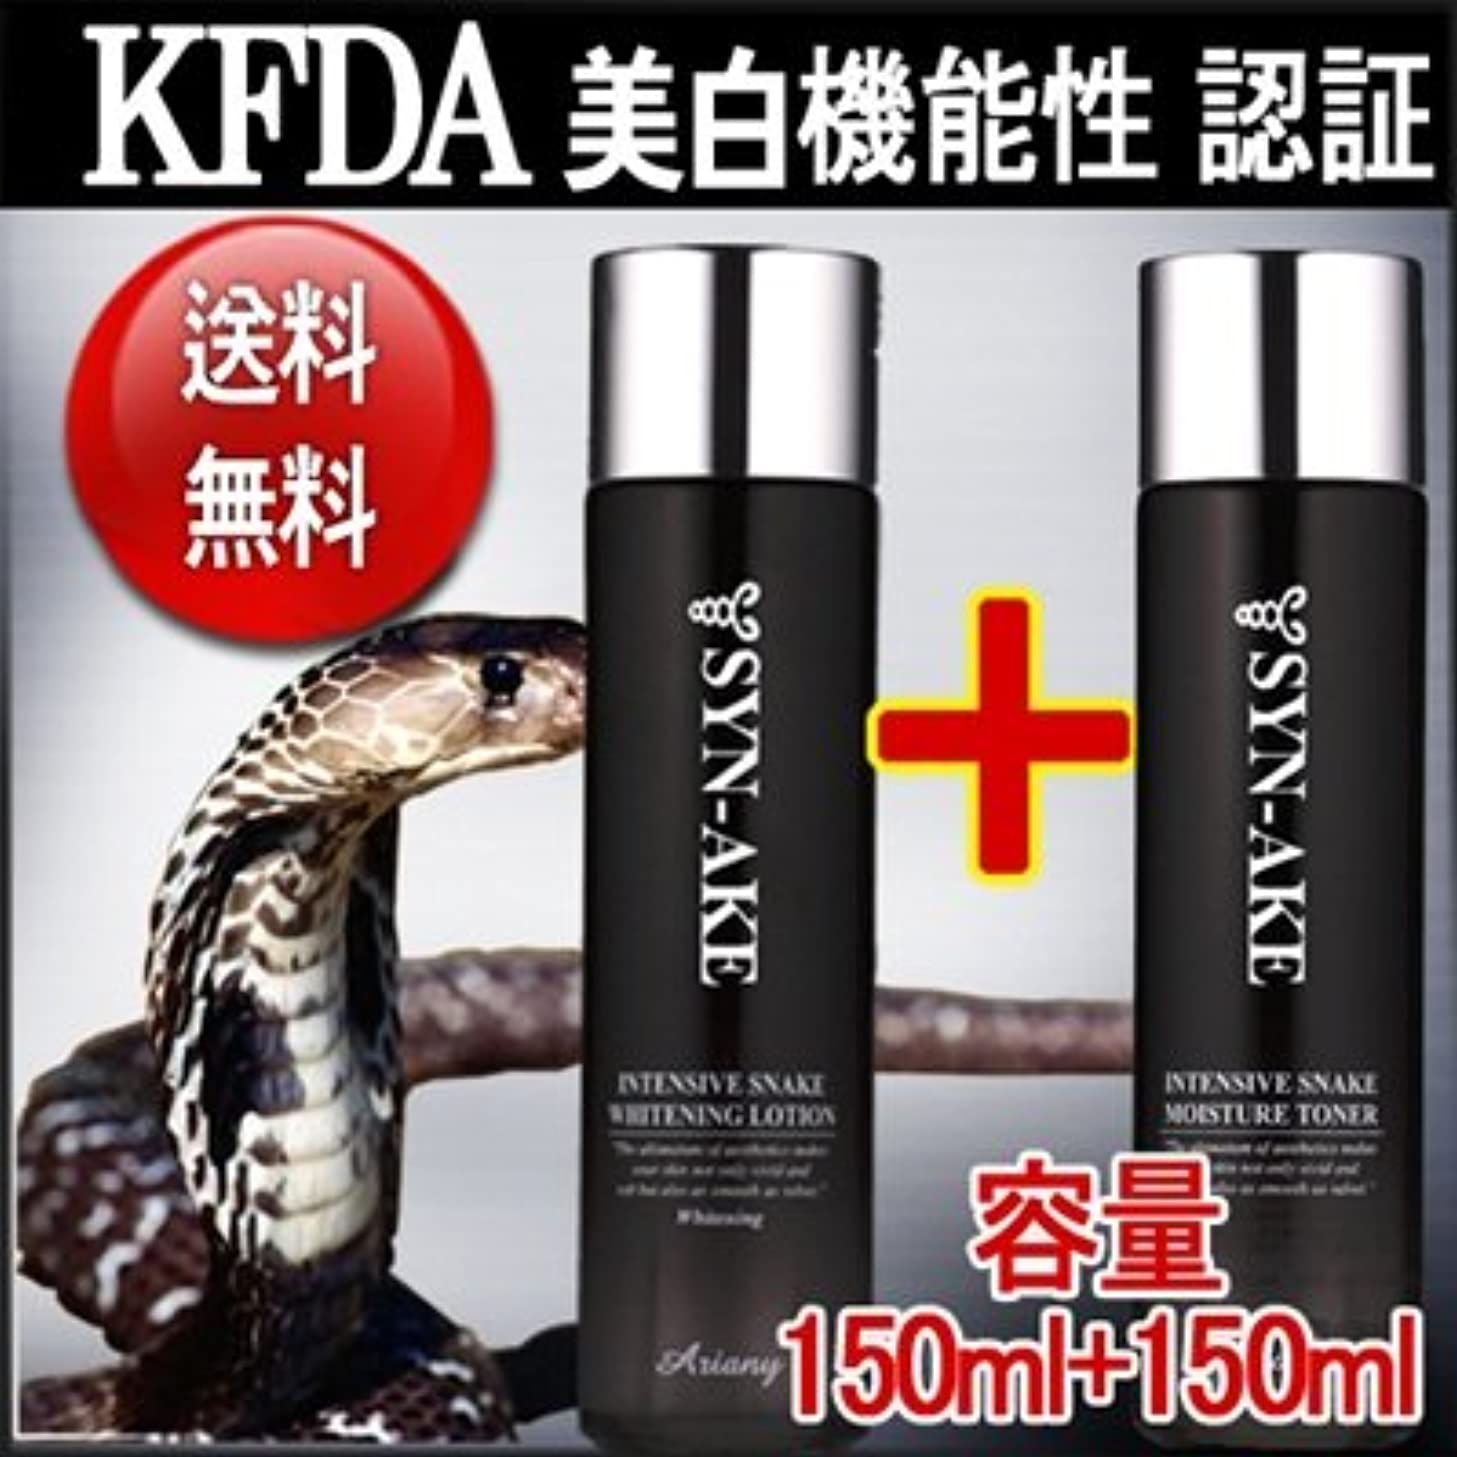 満了誕生請願者韓国アリアー二 (Ariany) 蛇毒/ 毒蛇化粧水&乳液2種セット